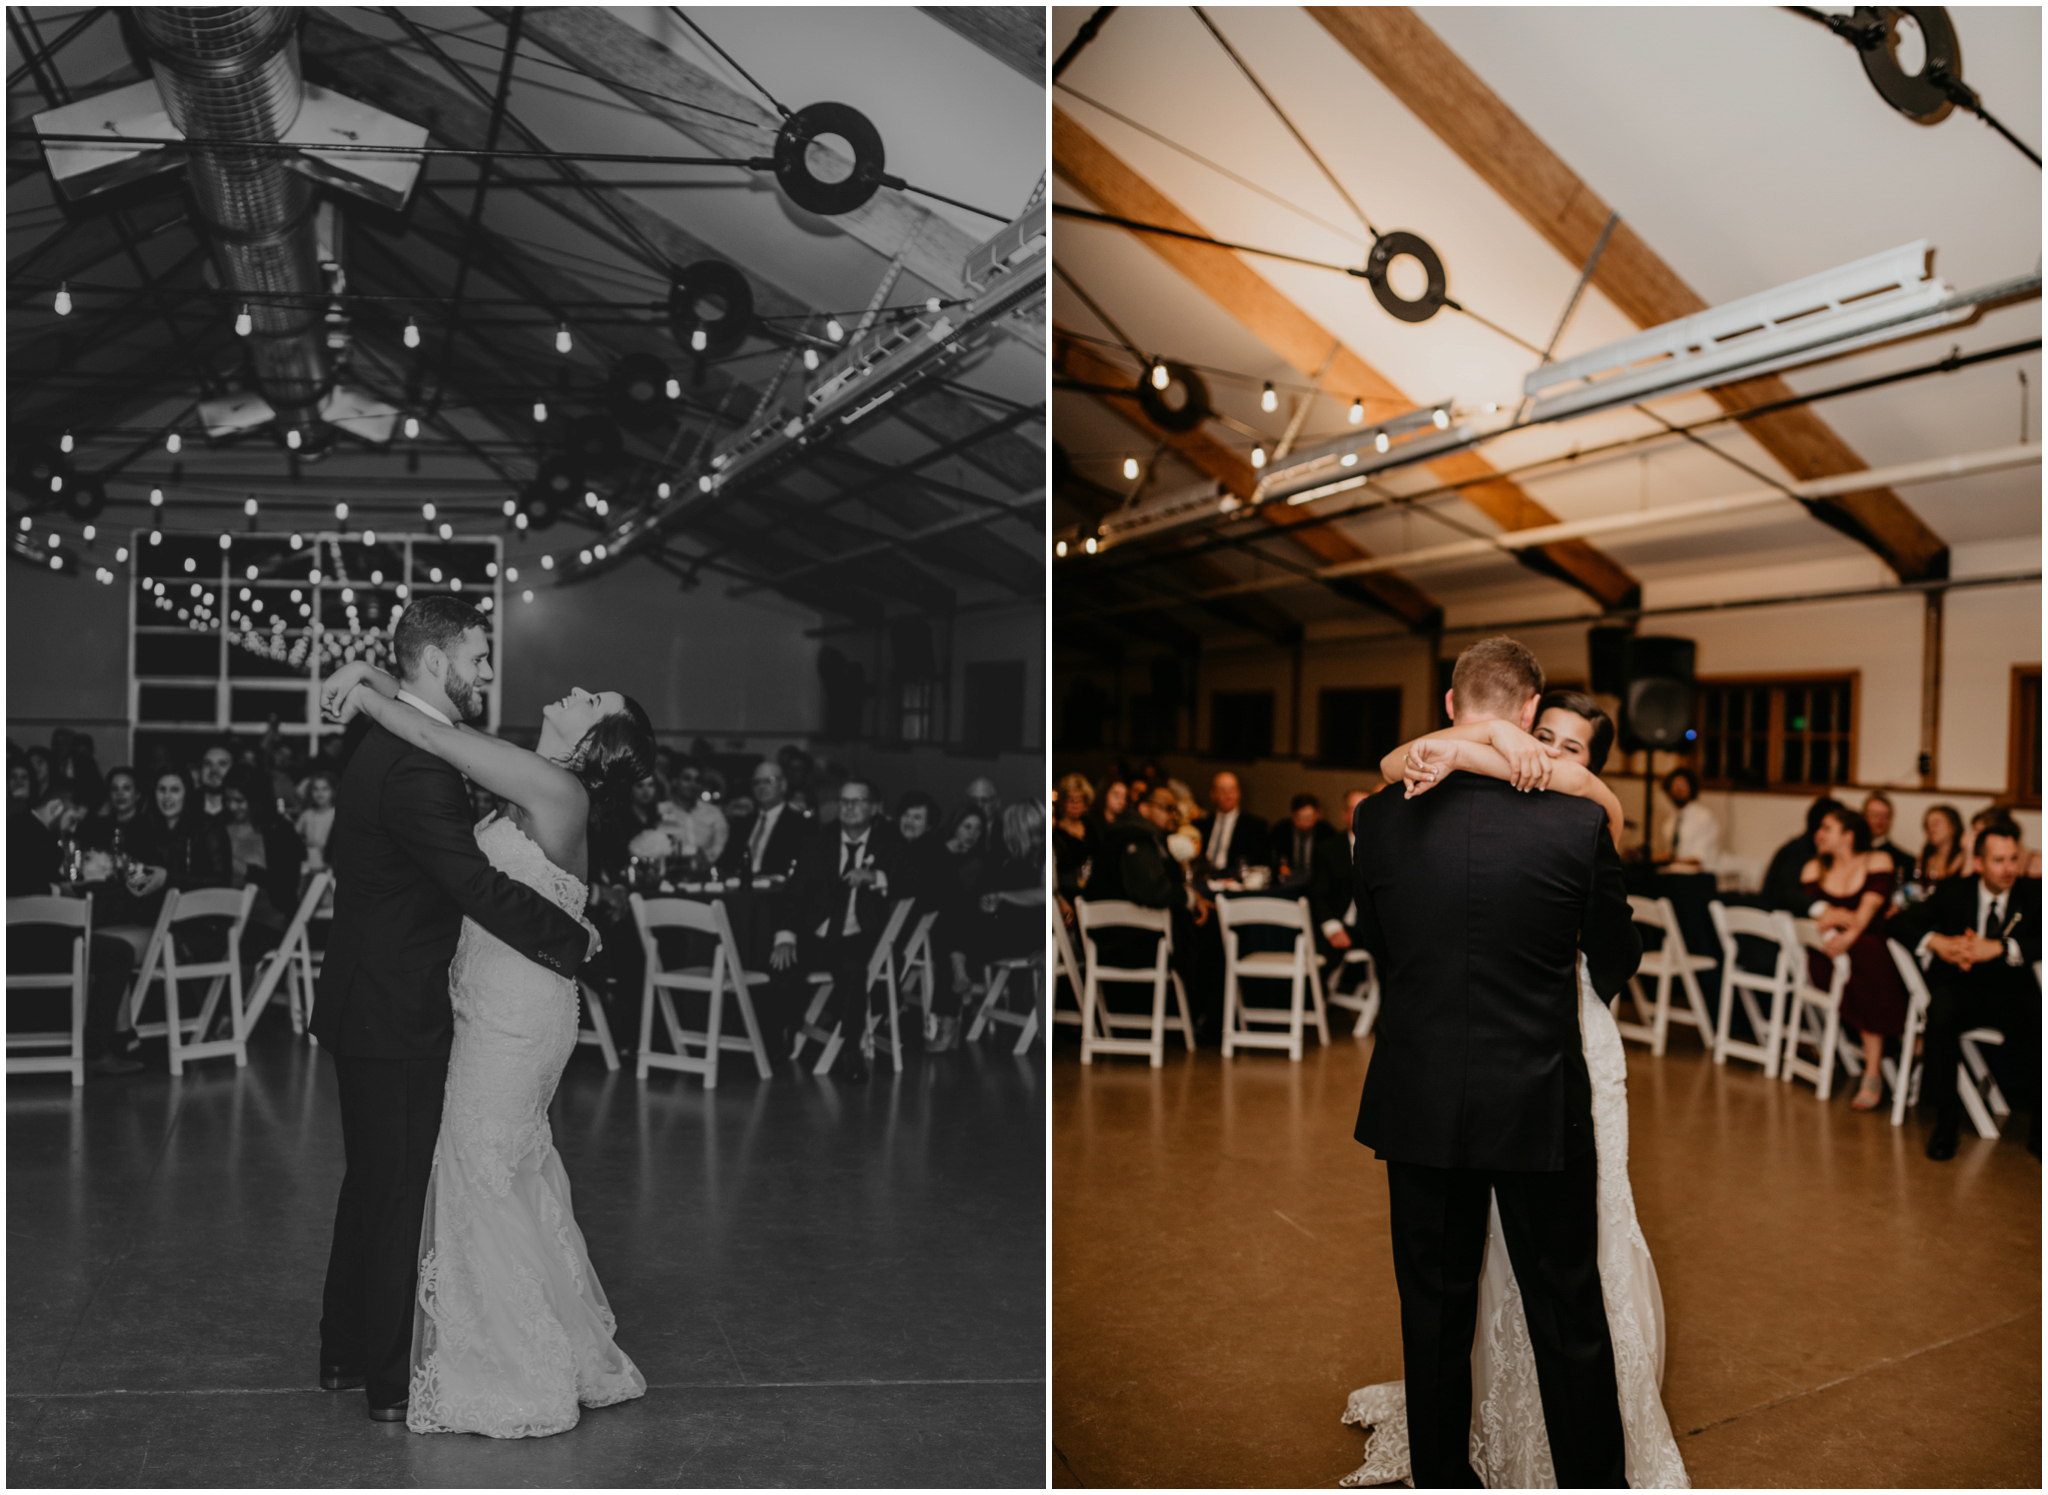 ashley-tj-the-pickering-barn-winter-wedding-seattle-photographer-085.jpg